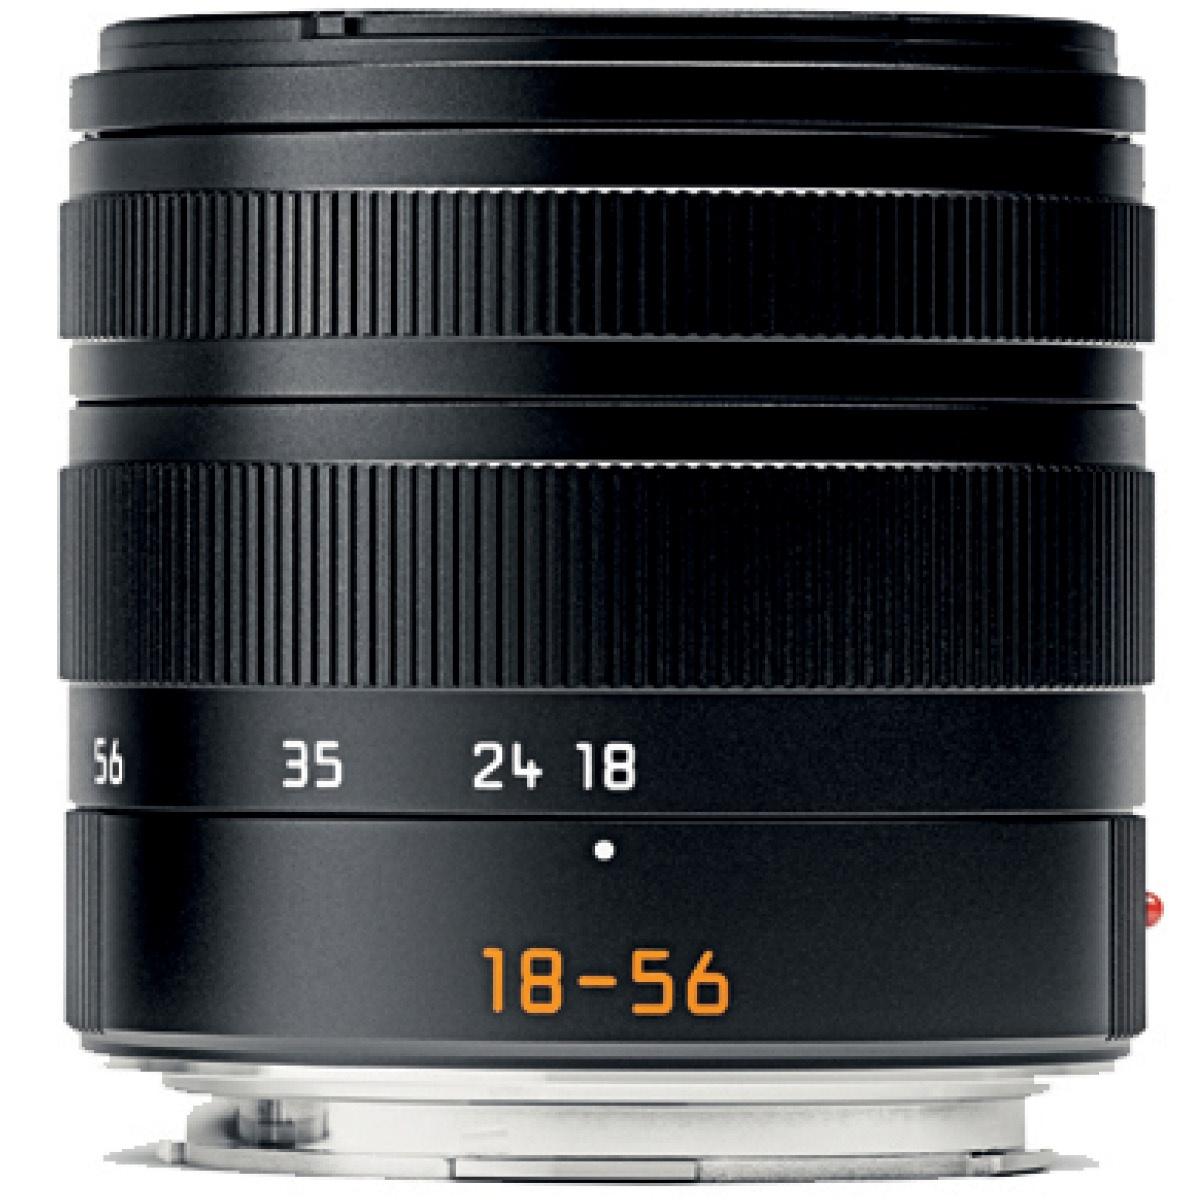 Leica 18-56 mm 1:3,5-5,6 Vario-Elmar-TL ASPH